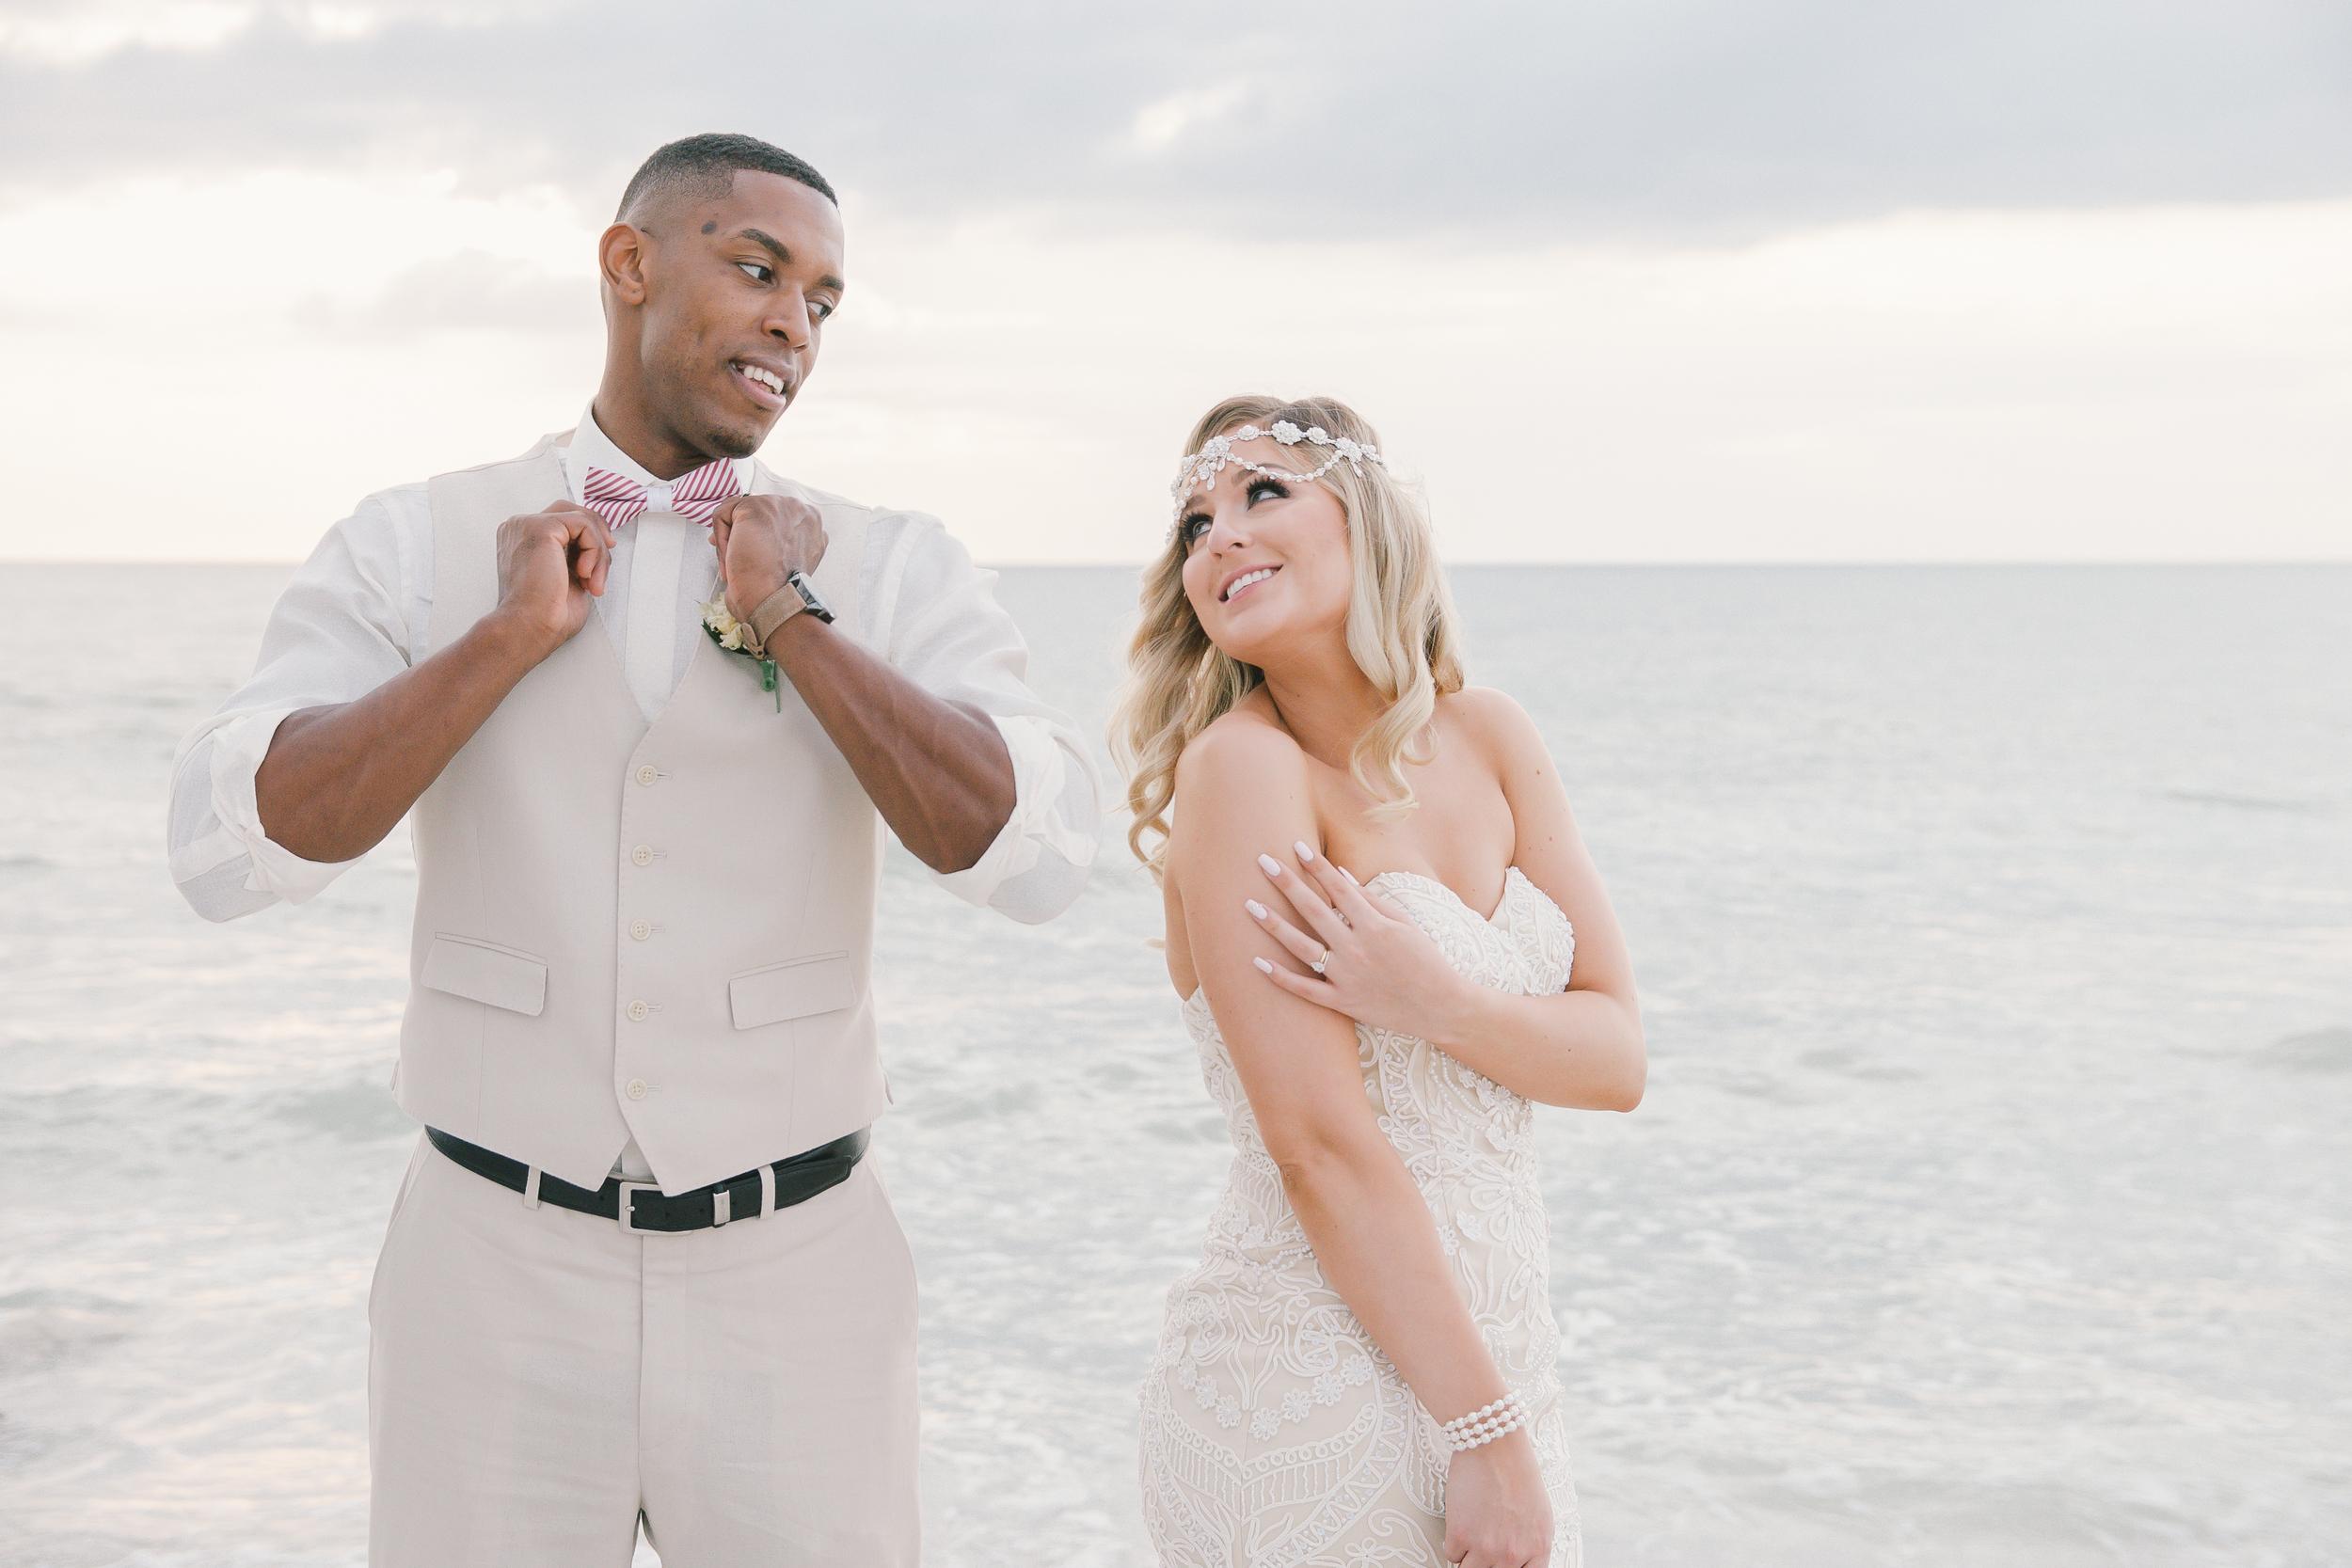 St.Petersburg wedding photographer, Tampa wedding photographer